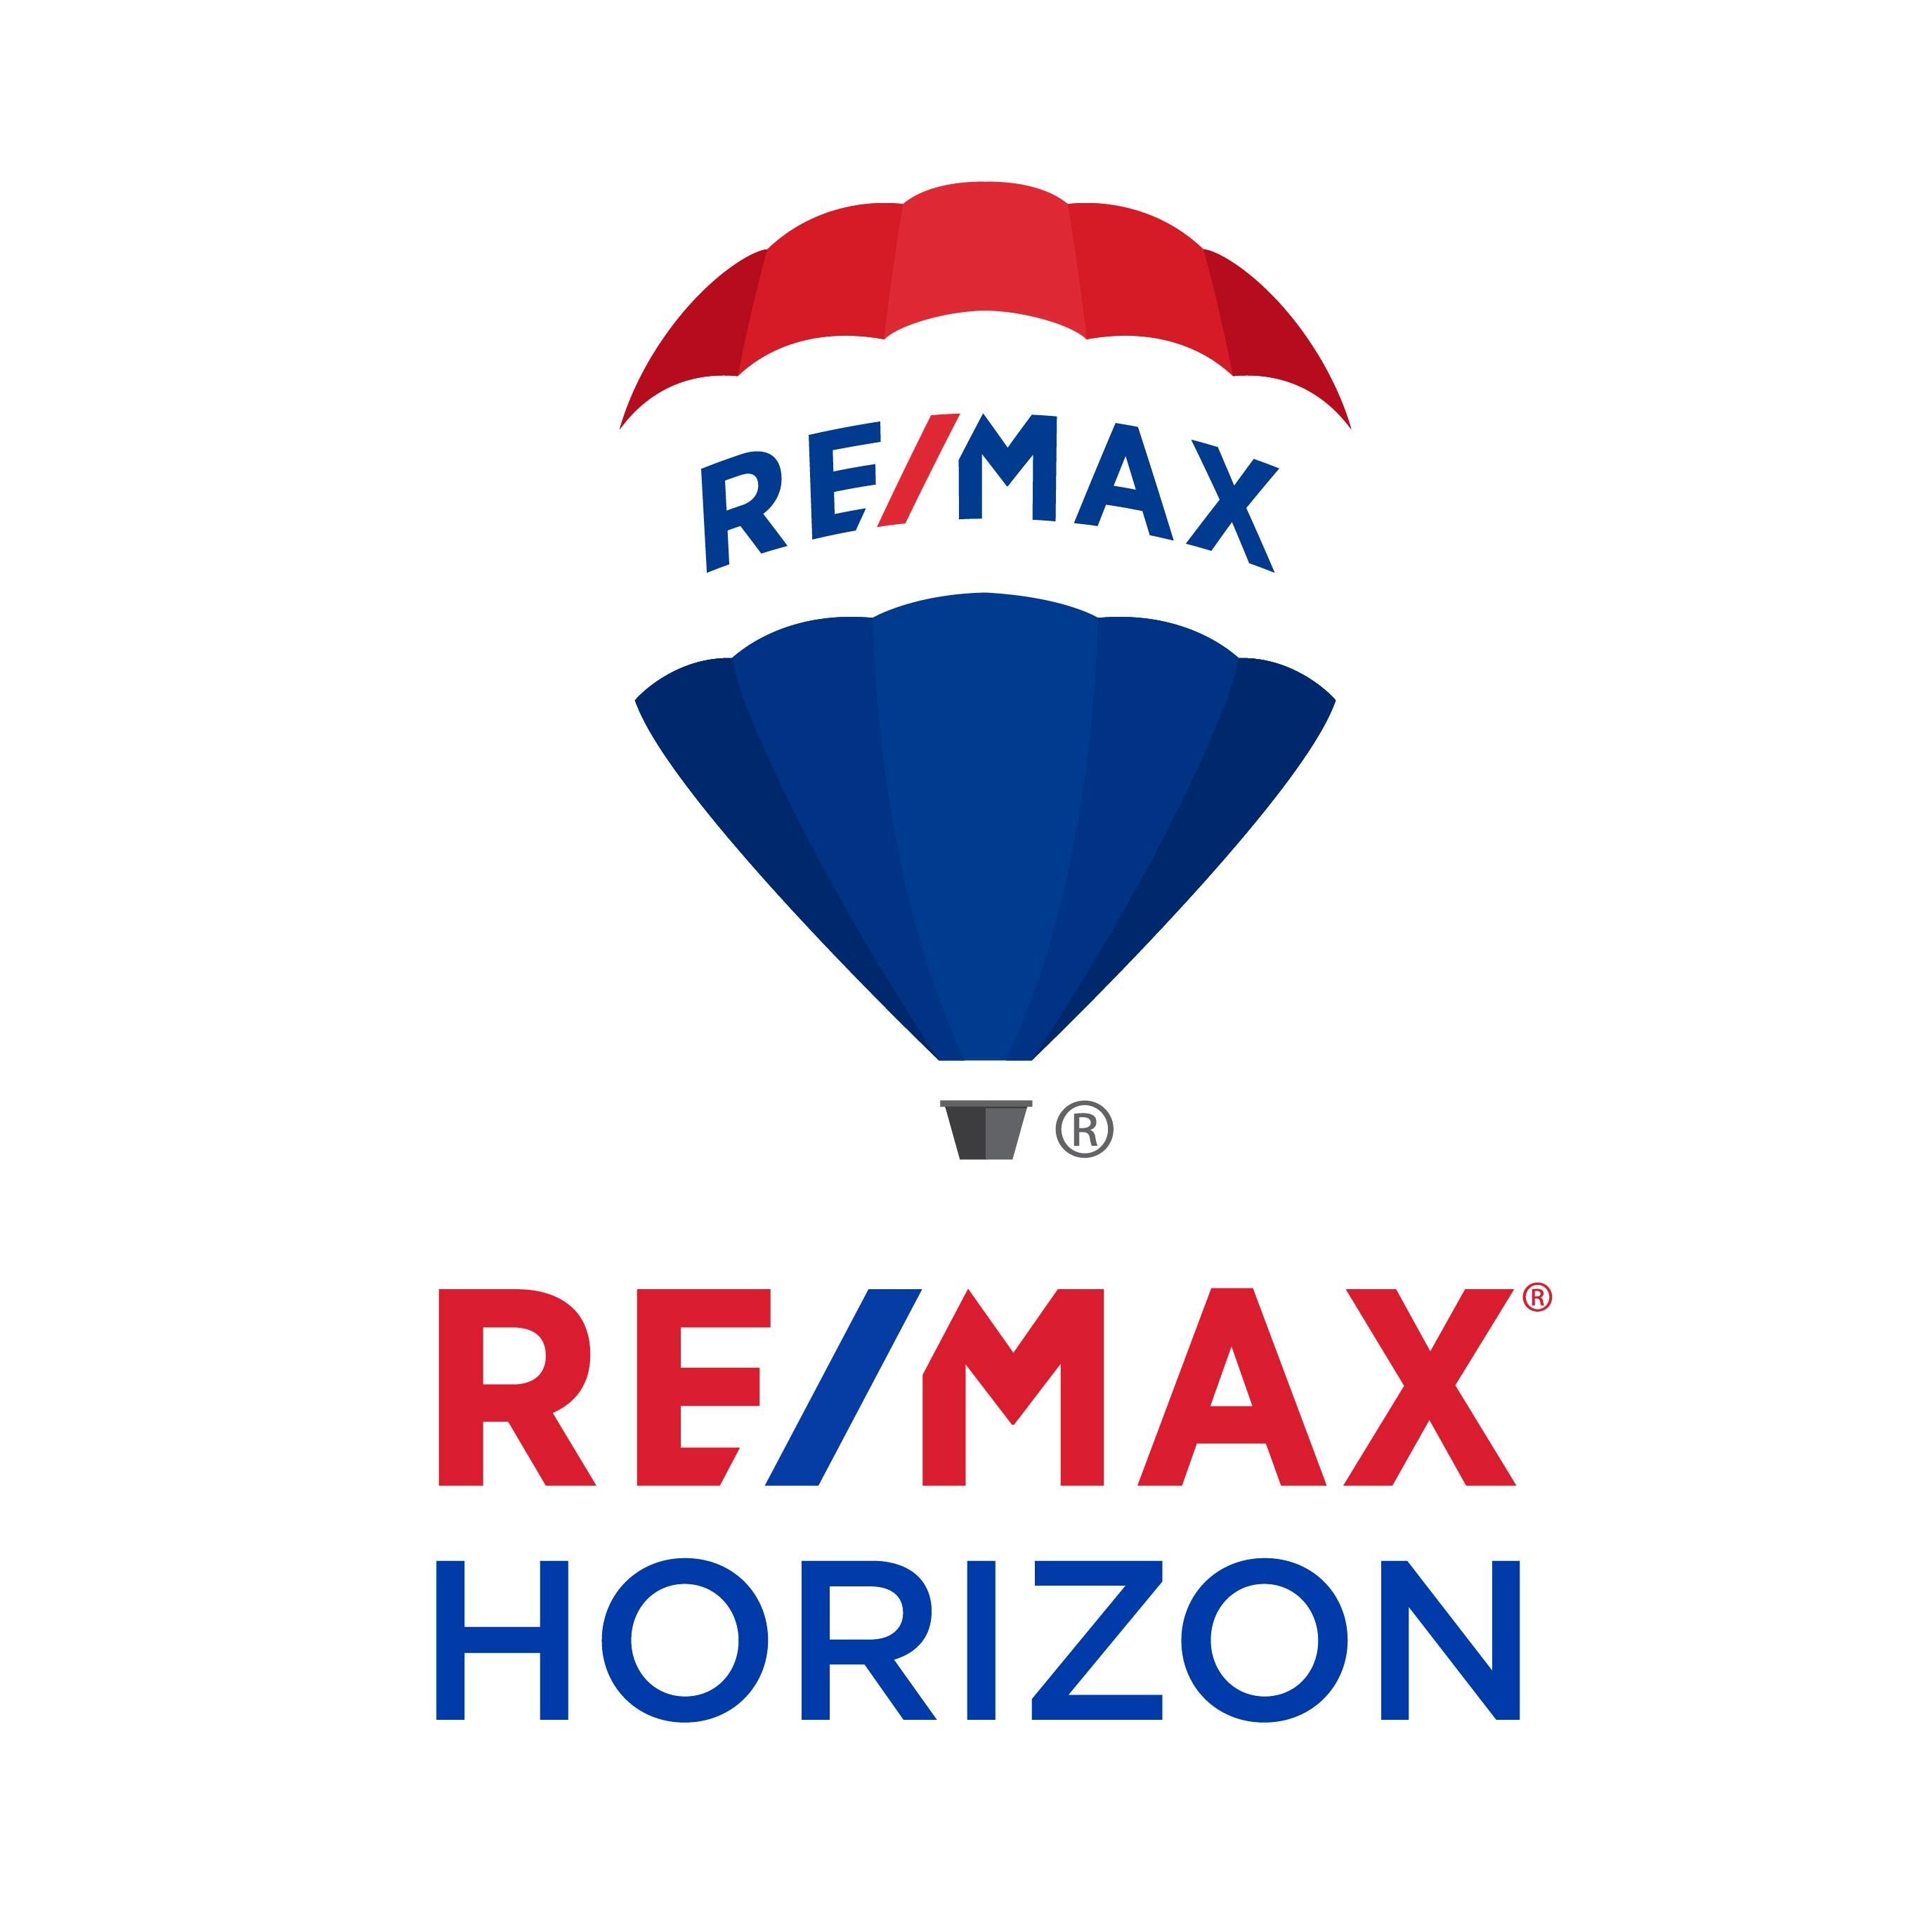 REMAX HORIZON - Inmobiliaria Las Rozas